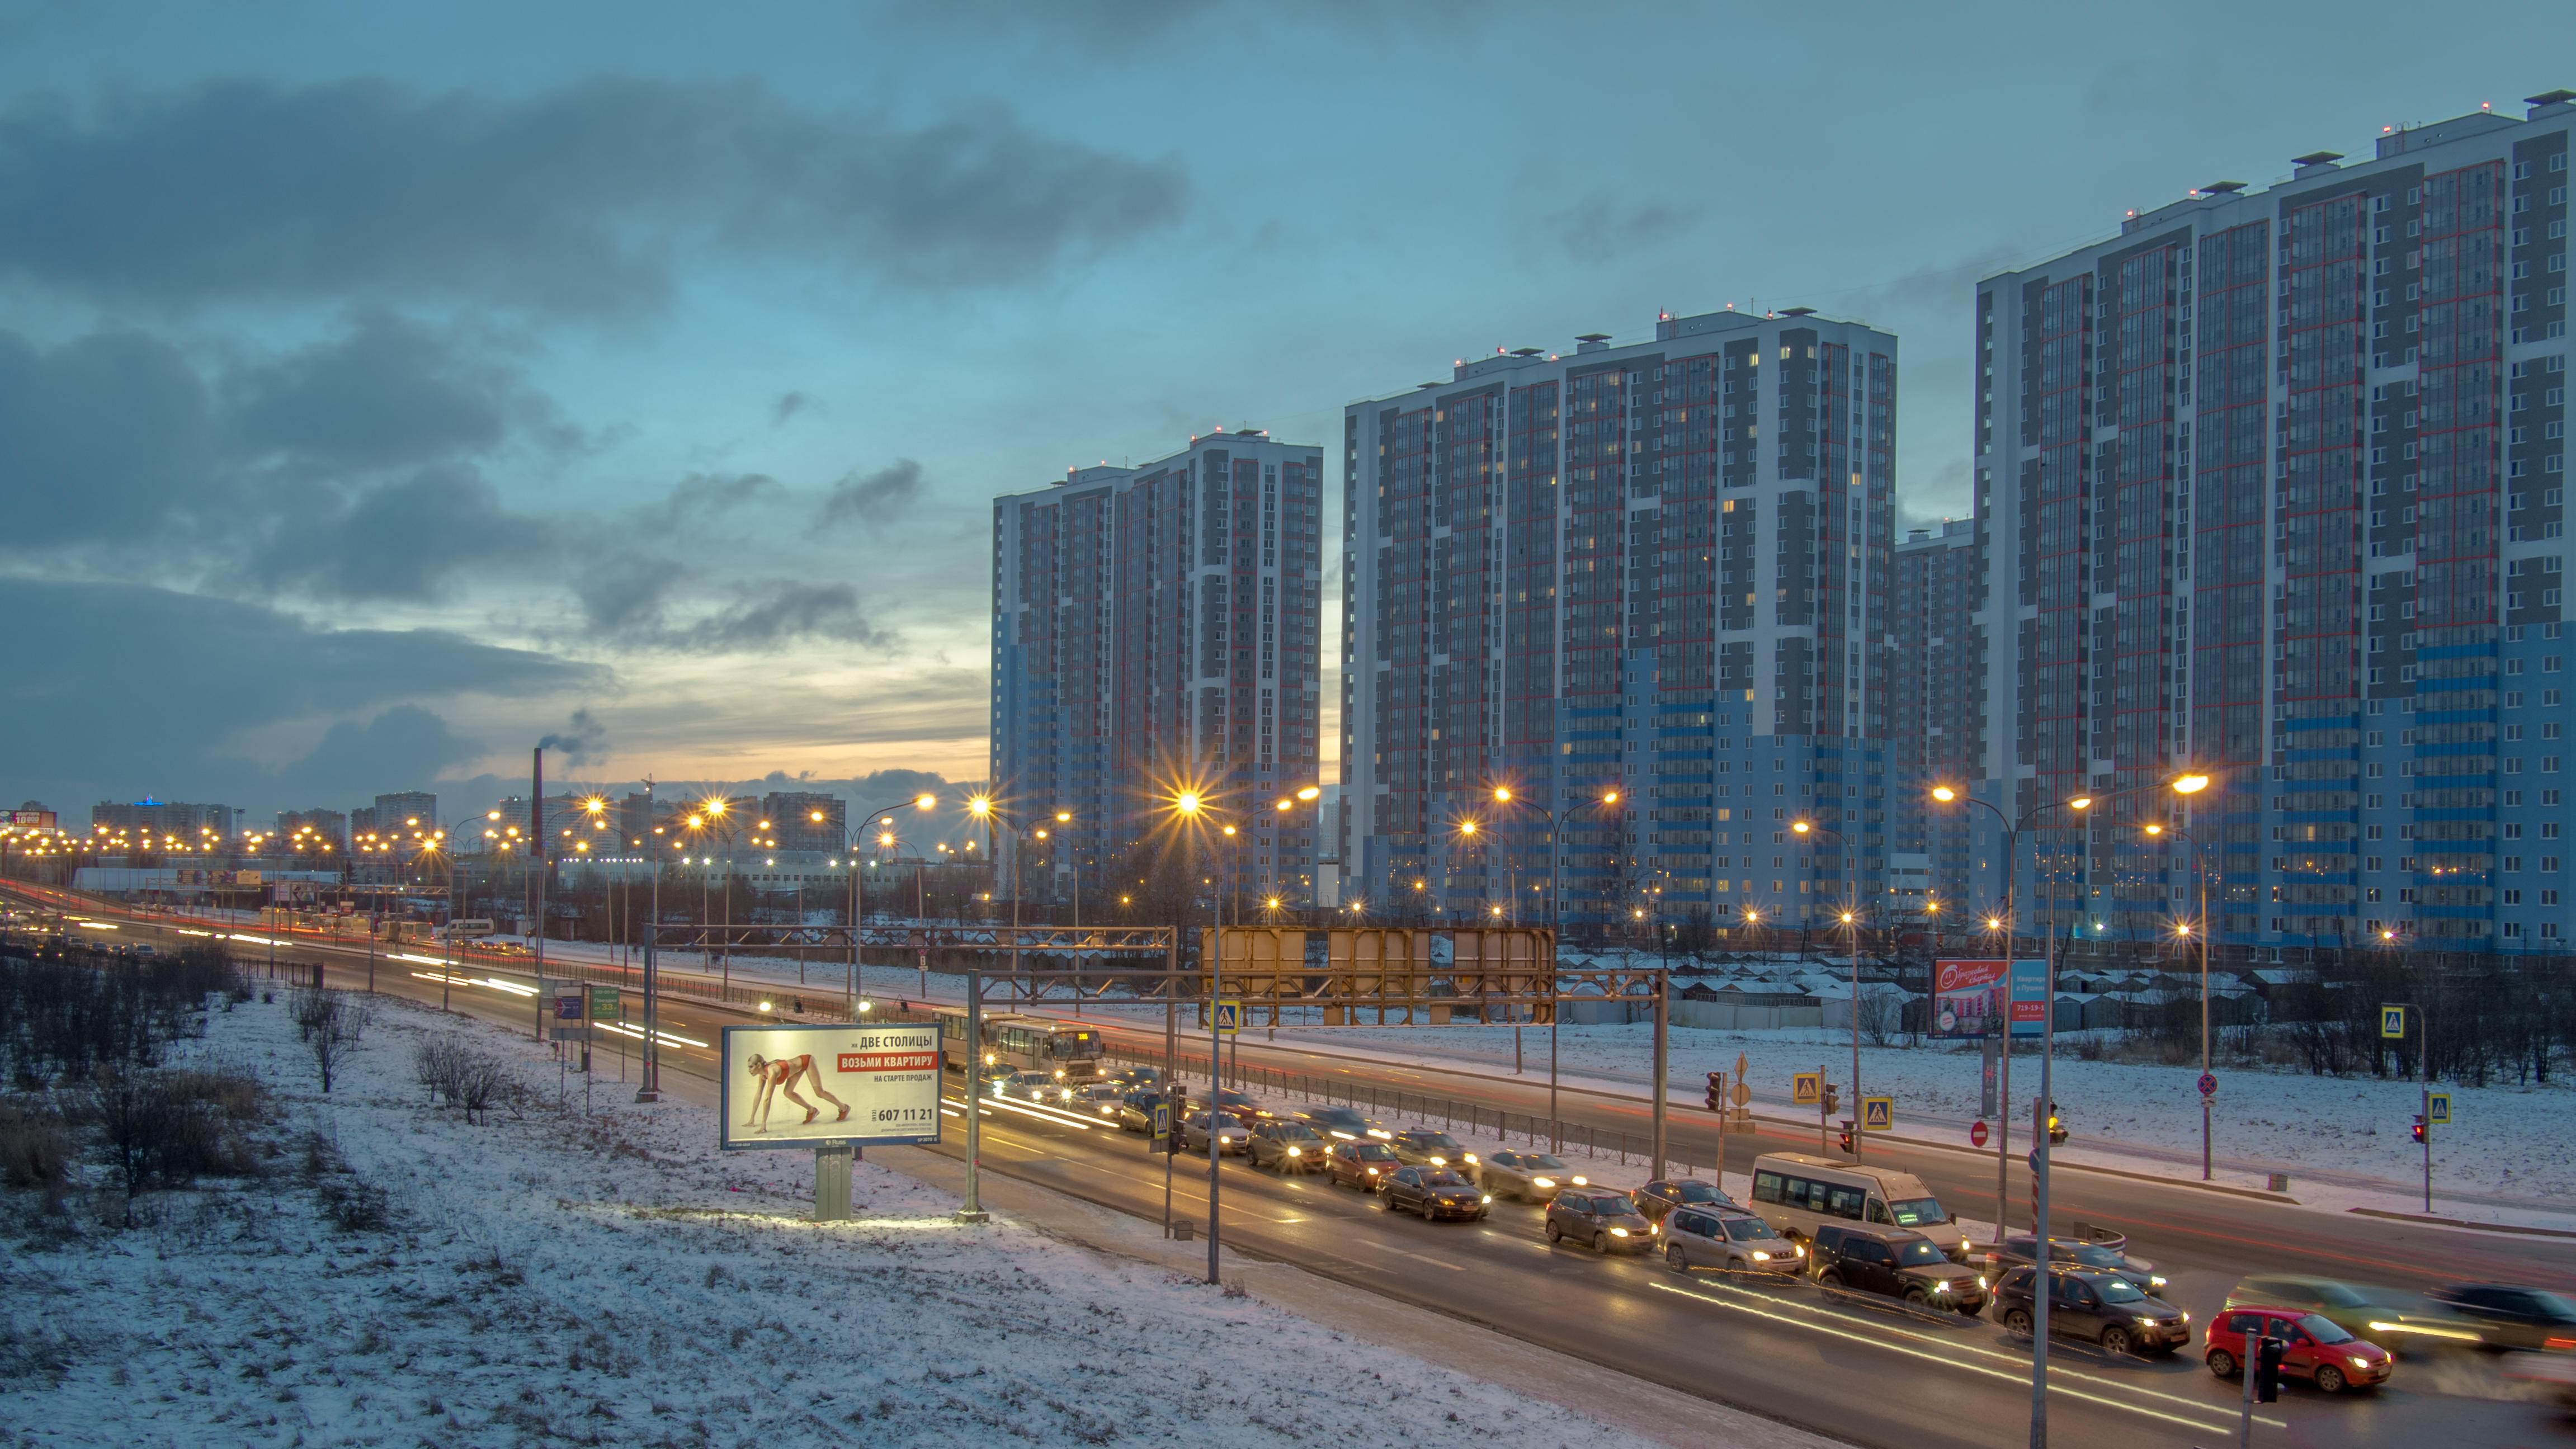 обои Vitebskiy prospect, St Petersburg картинки фото